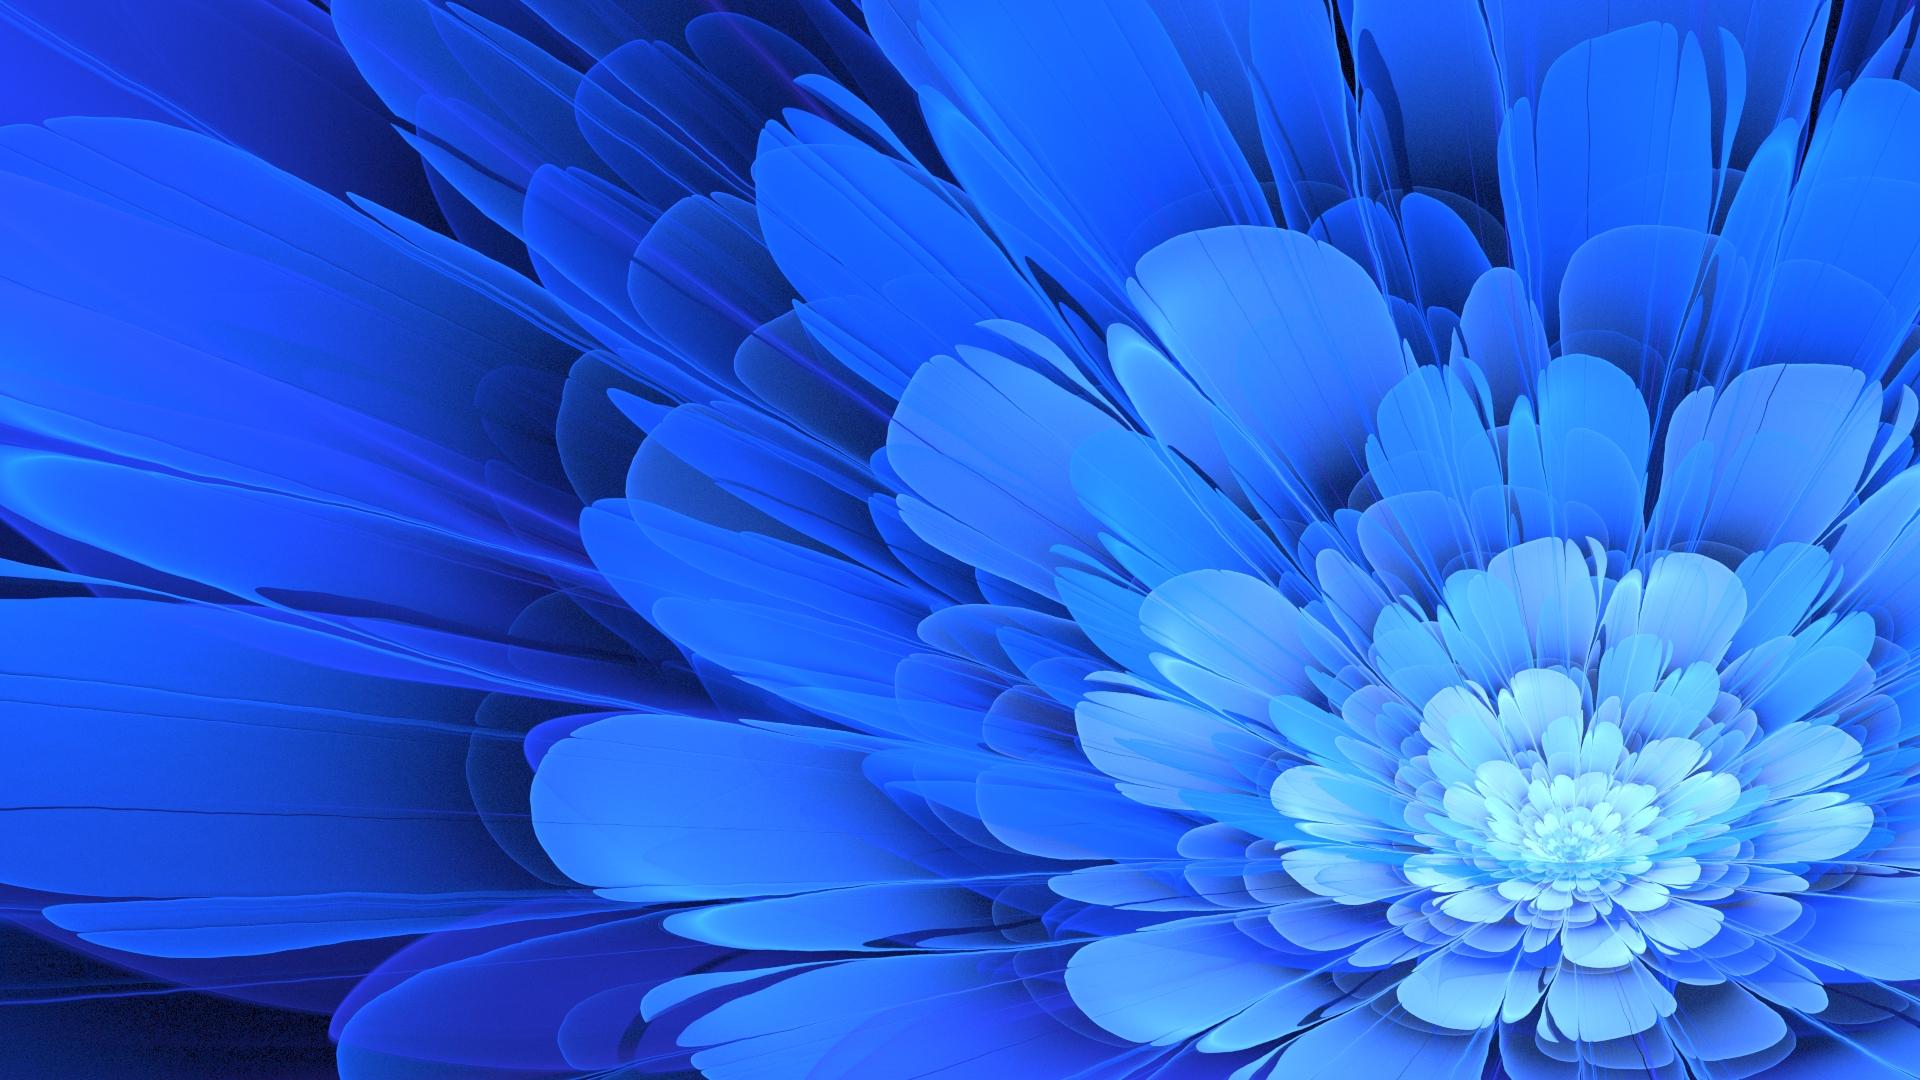 Wallpaper : 1920x1080 px, Apophysis, blue flowers ...